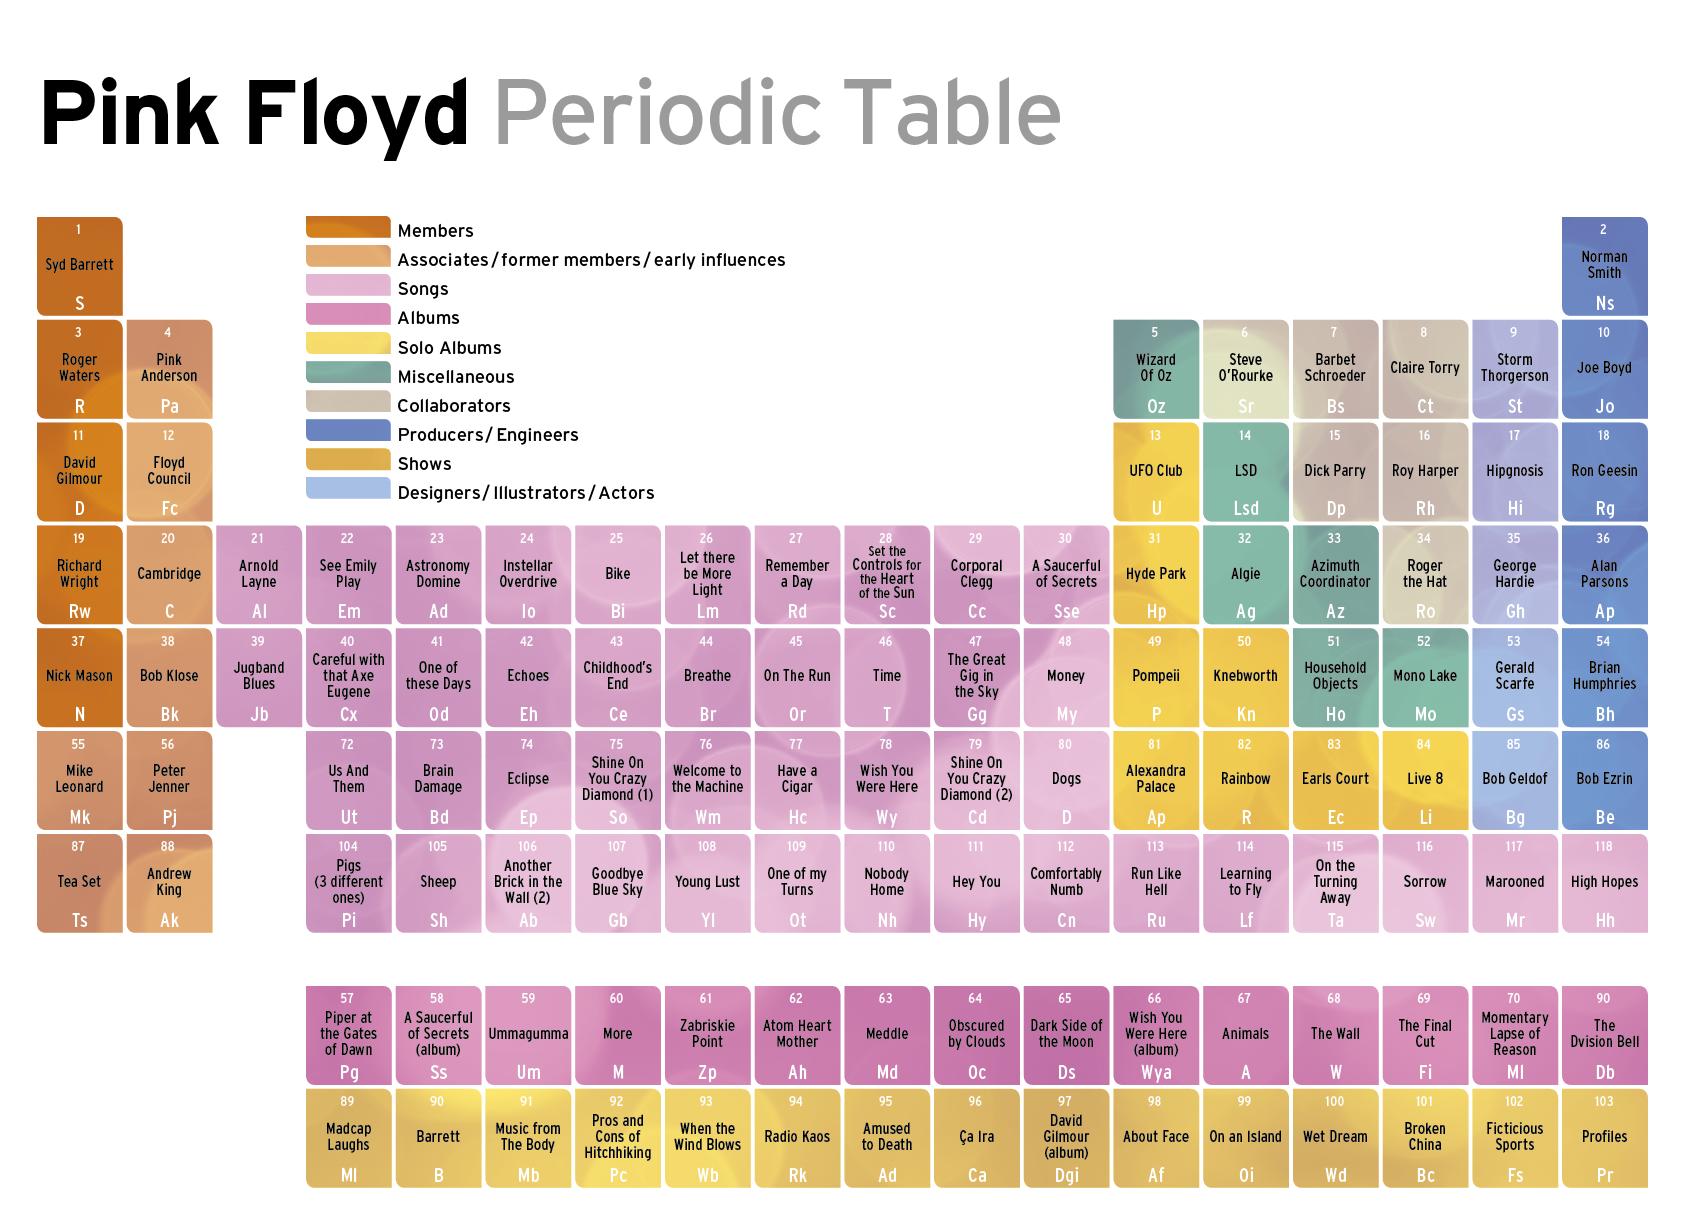 Periodic table pink floyd pinterest periodic table pink periodic table pink floyd pinterest periodic table pink floyd and tables gamestrikefo Choice Image